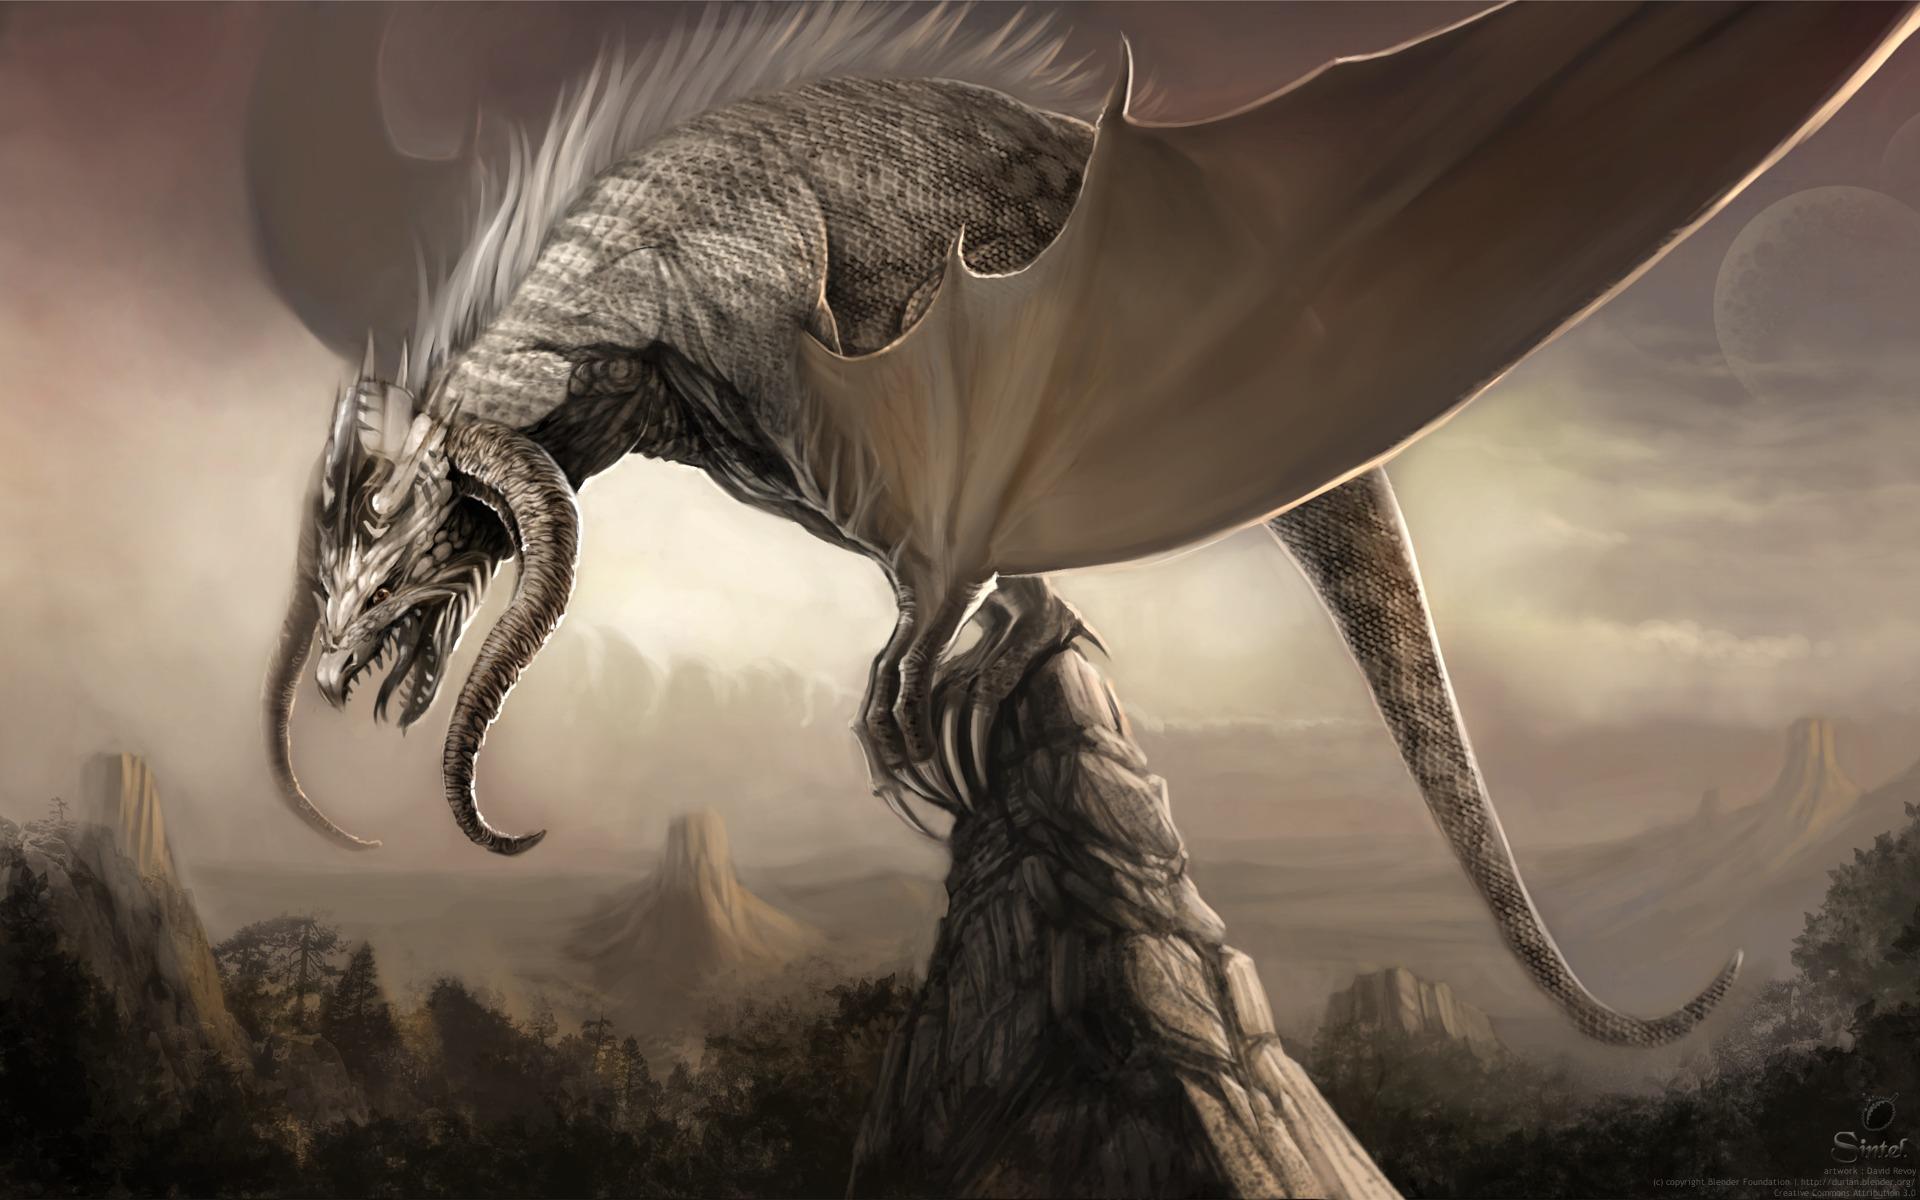 Fantasy Dragon Wallpaper Background 1920 x 1200 Id 78308.